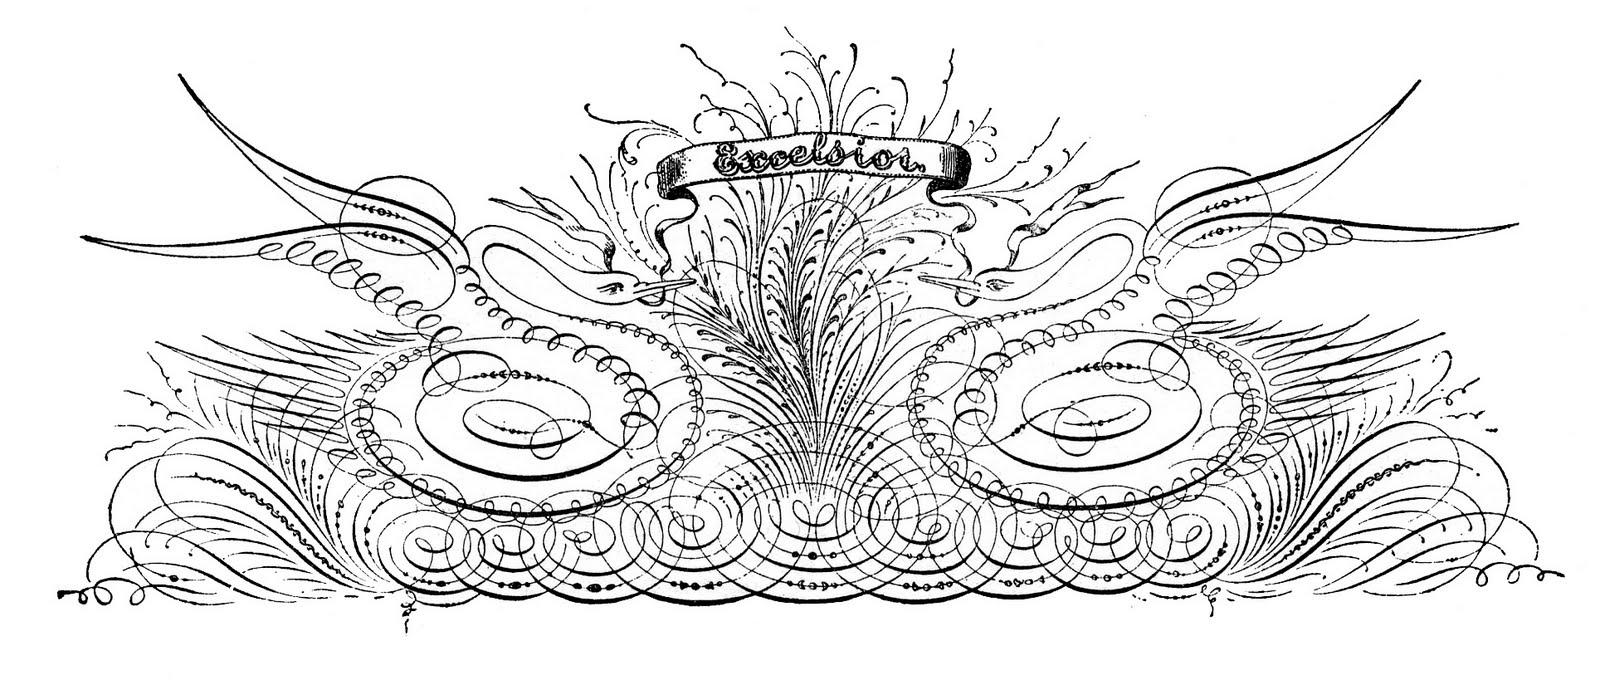 Pen-Flourish-Swans-GraphicsFairy